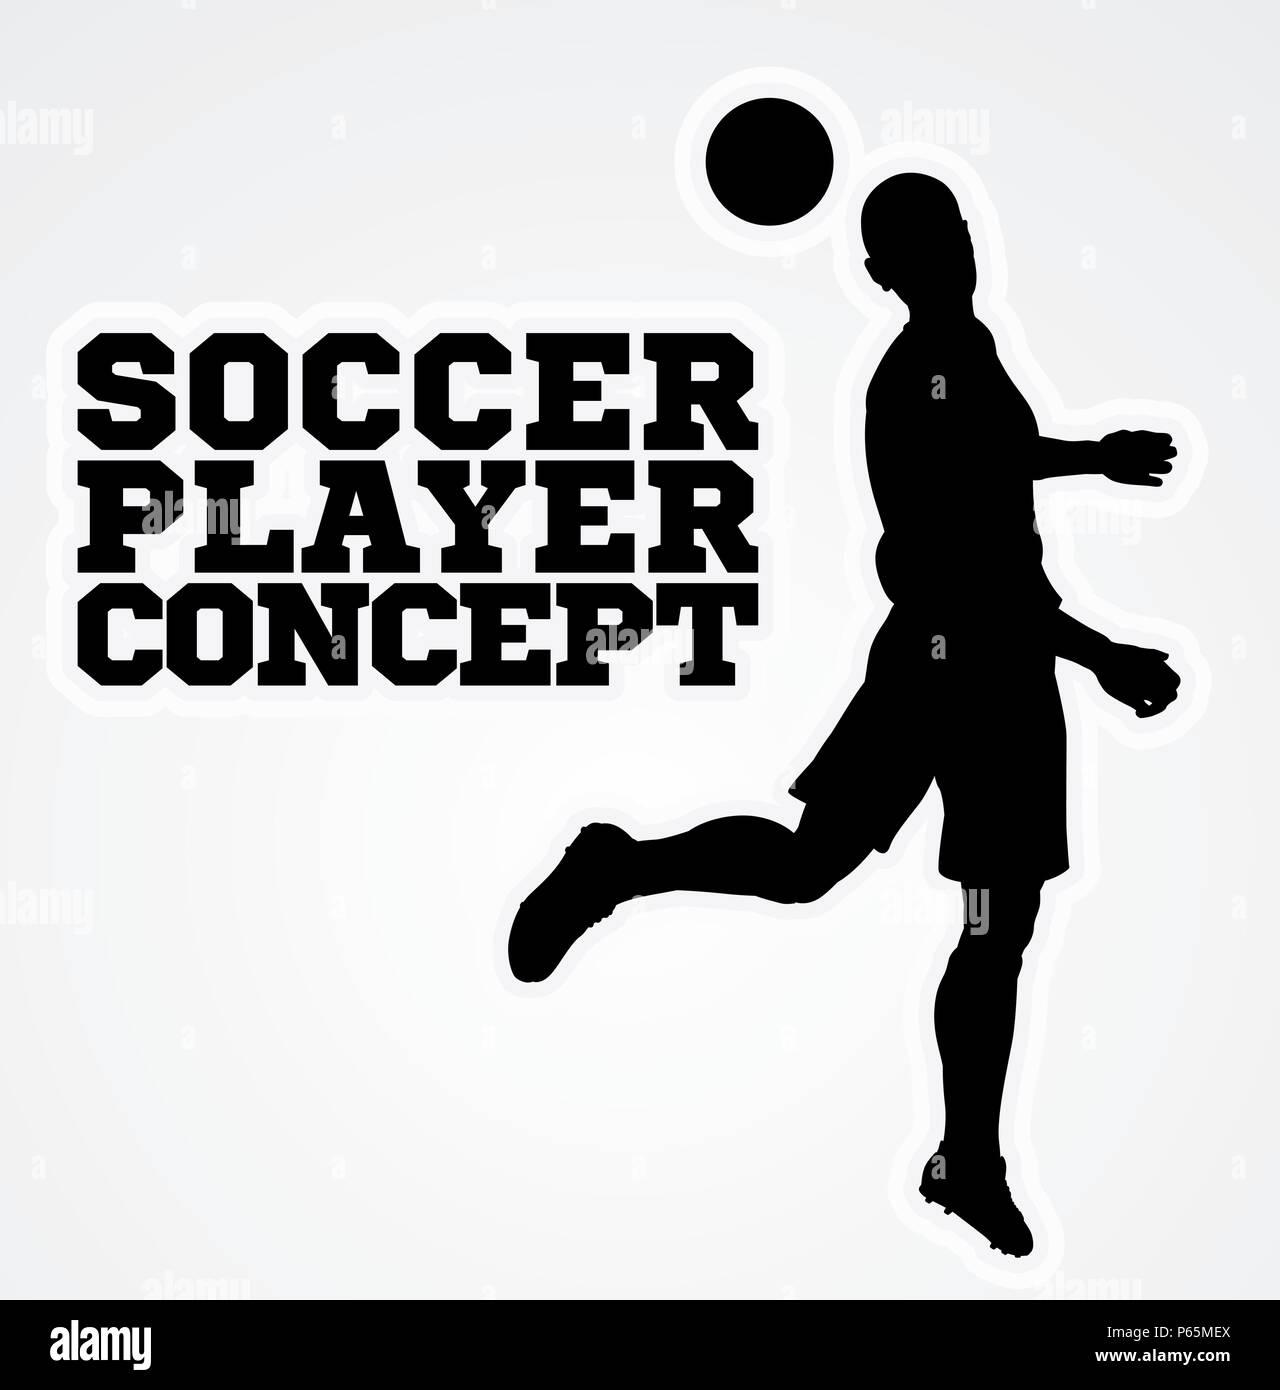 Heading Soccer Football Player Concept Silhouette - Stock Vector